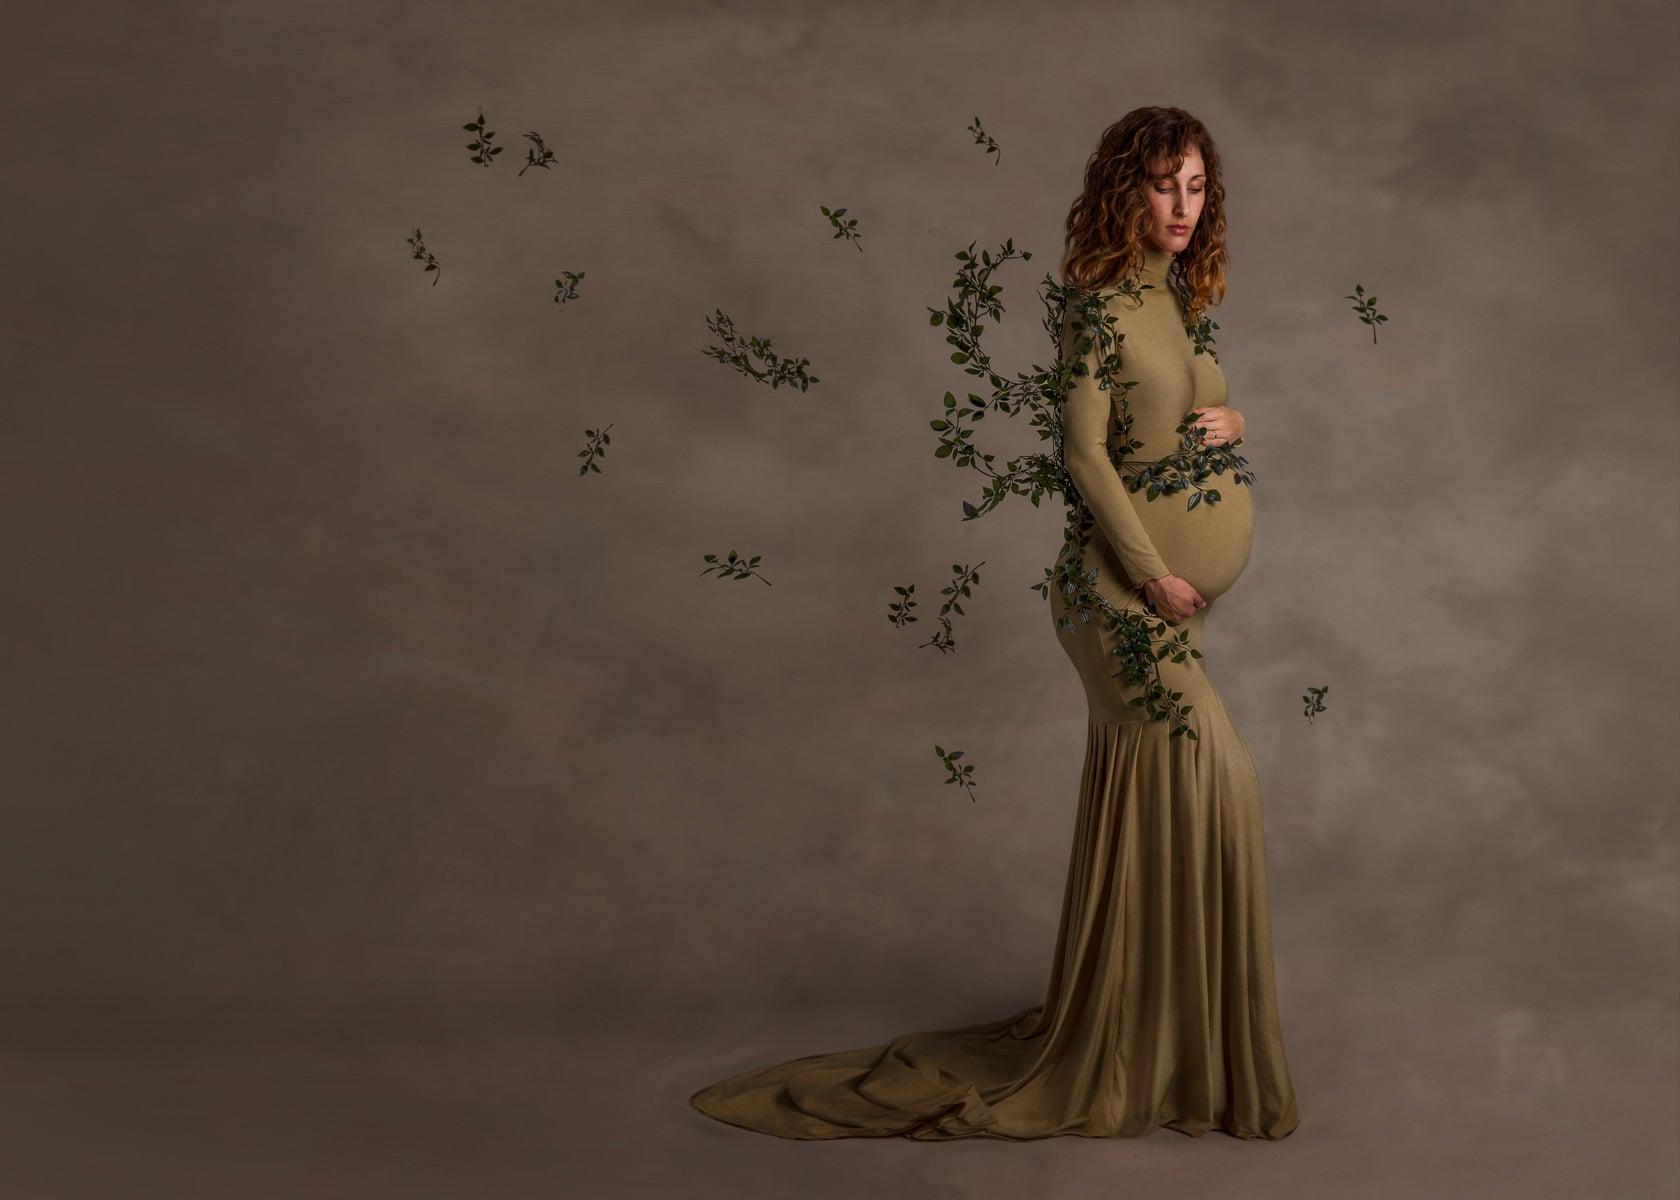 KRISTINA RECHE Petit Monde WORKSHOP FOTOGRAFIA MATERNITY EMBARAZO 90011 - Maternity